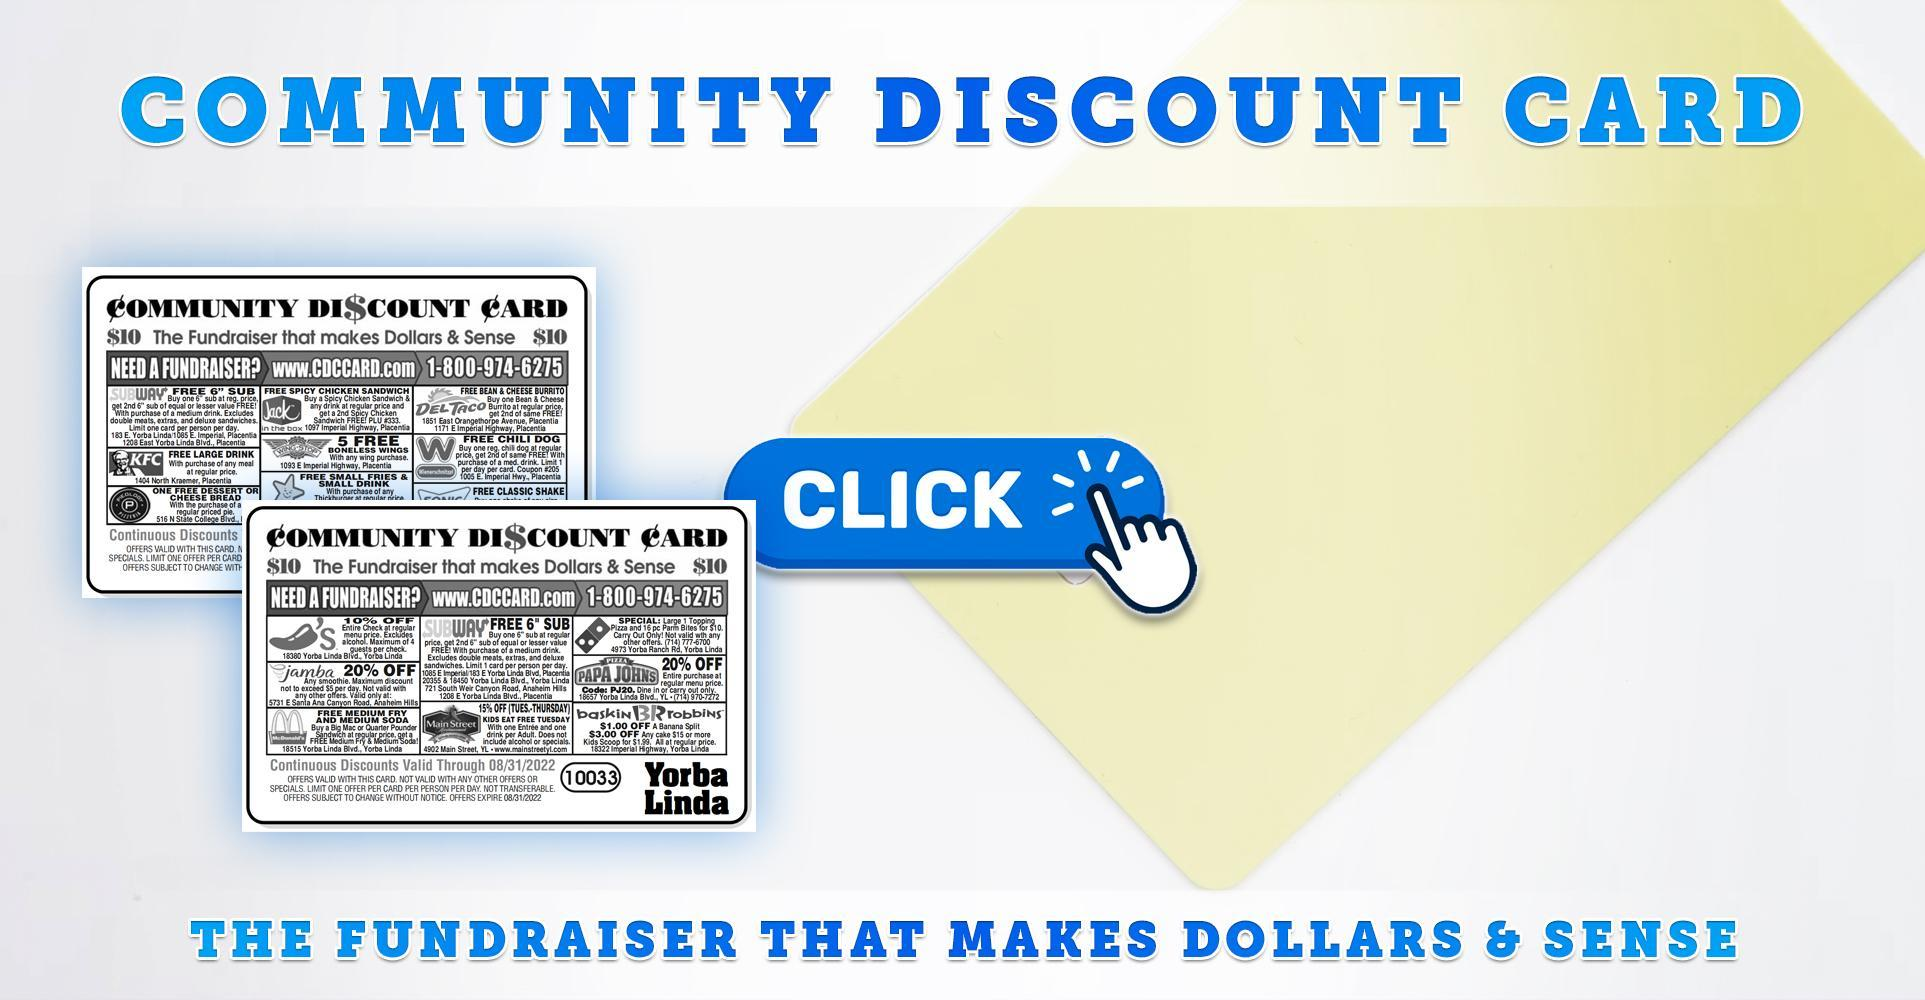 Community Discount Card